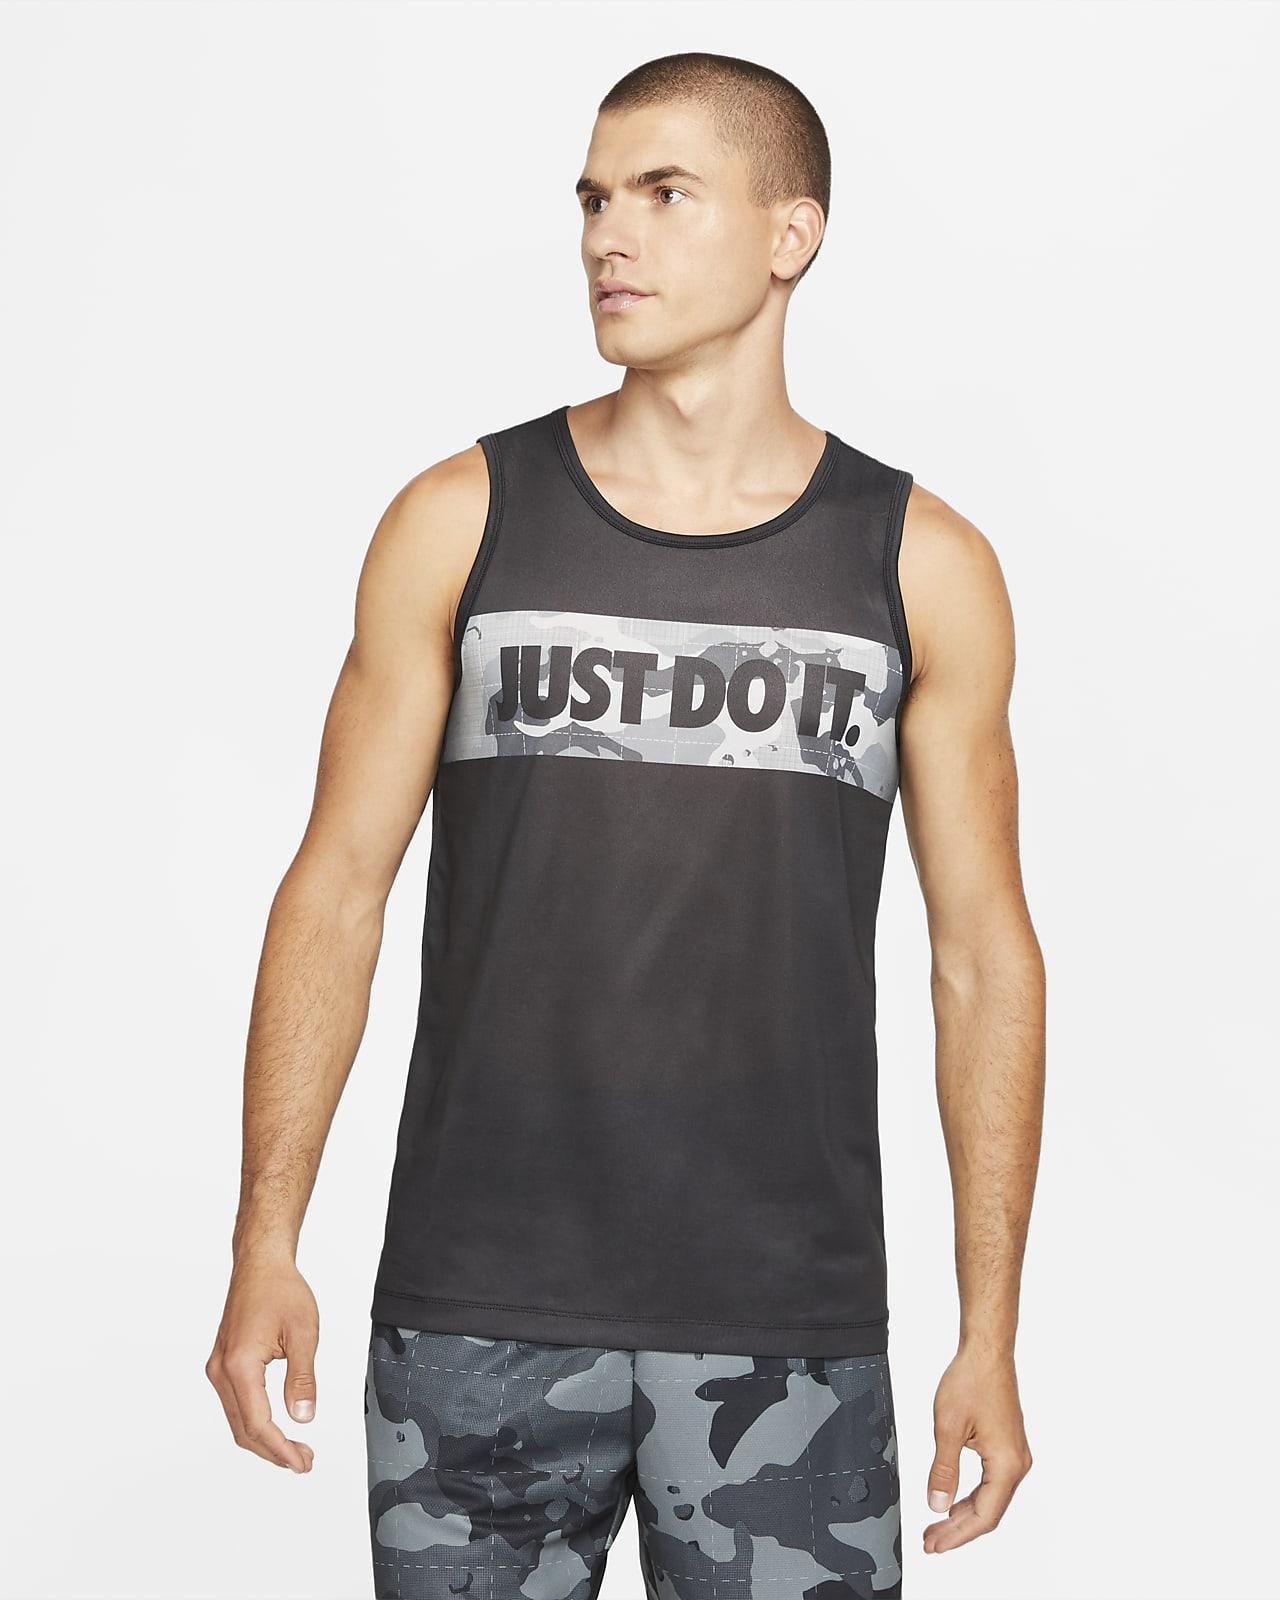 Nike Dri-FIT Men's Camo Graphic Training T-Shirt